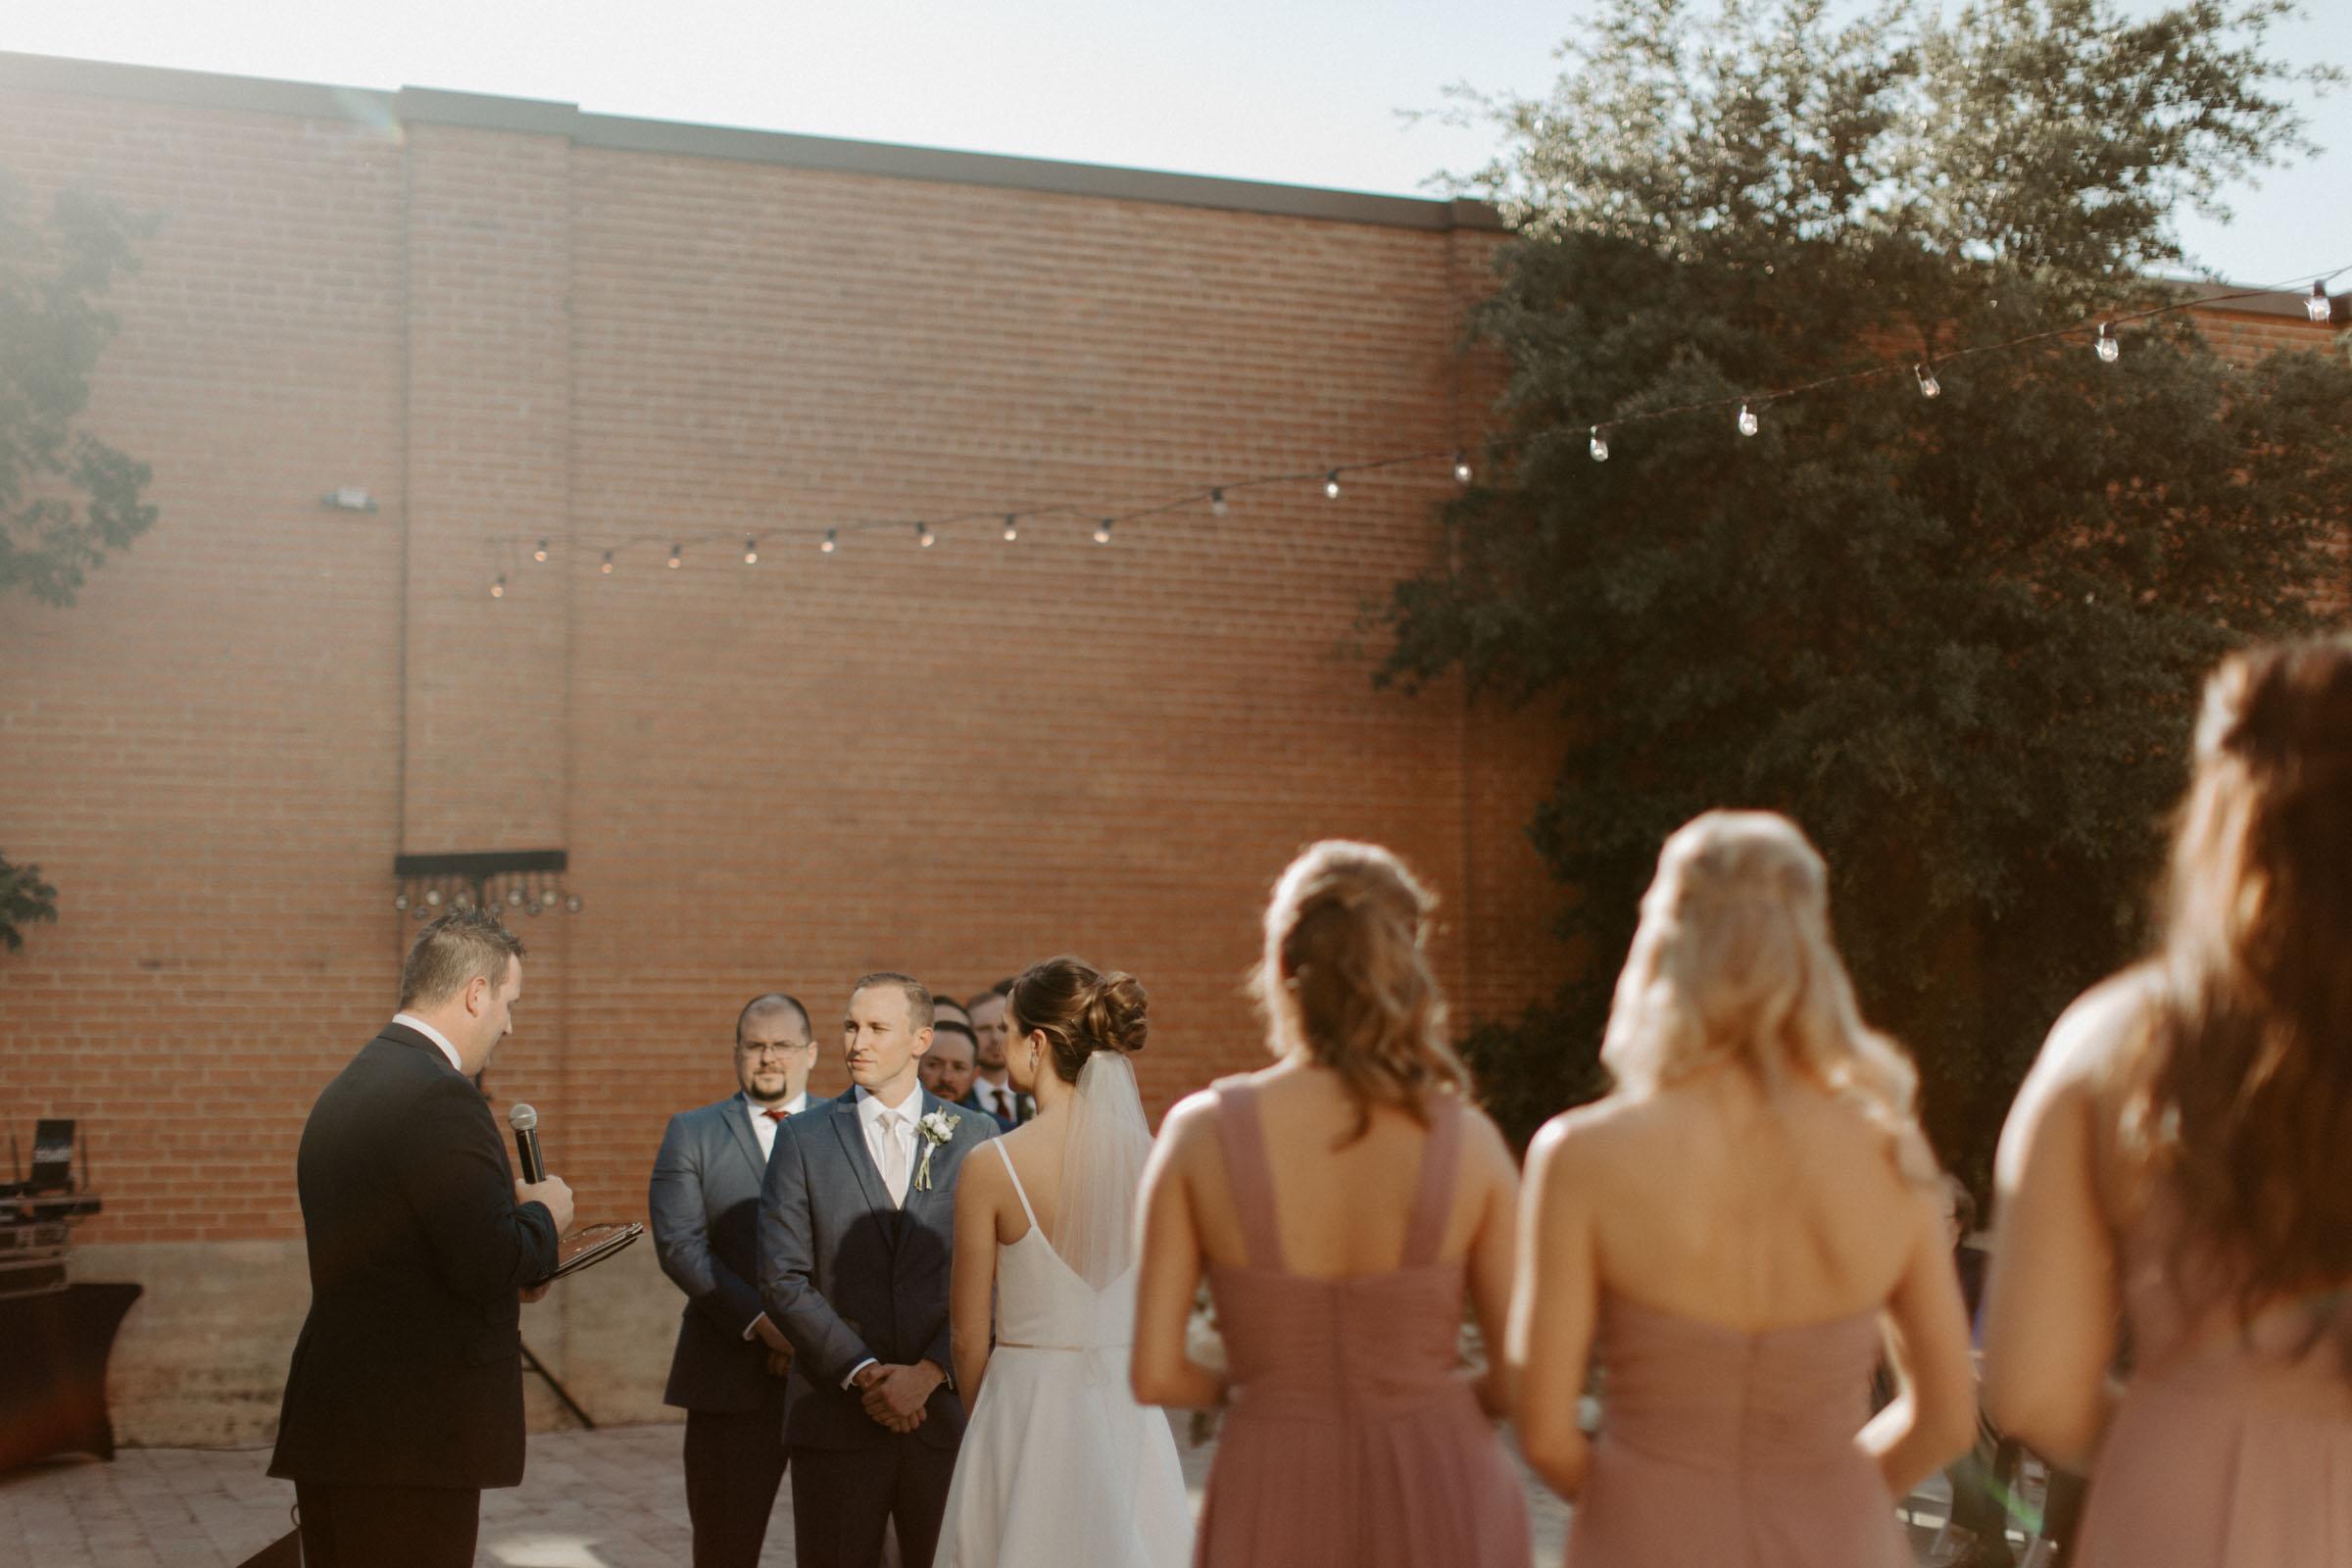 wedding photography pricing